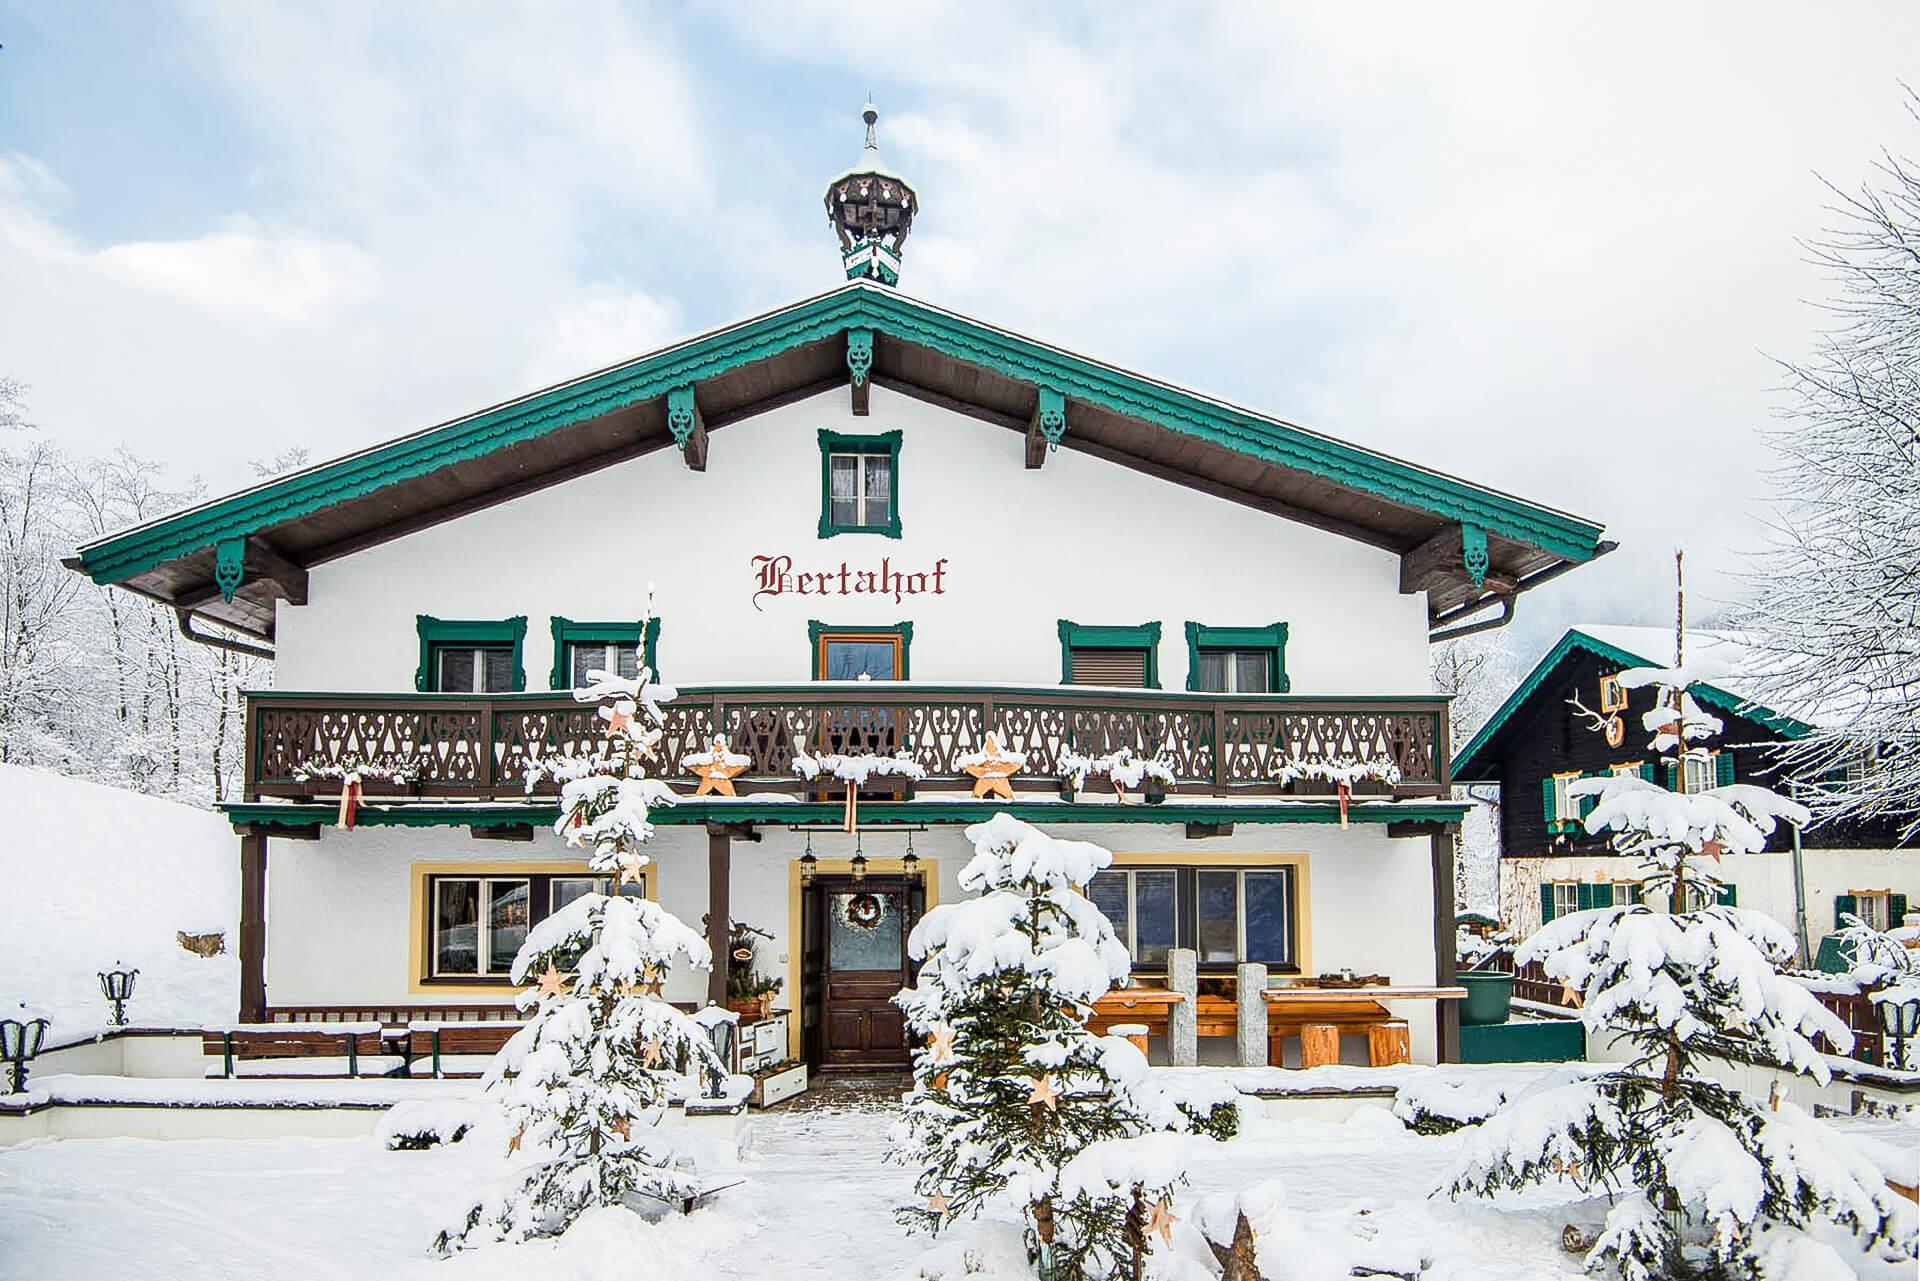 Restaurant Bertahof im Winter